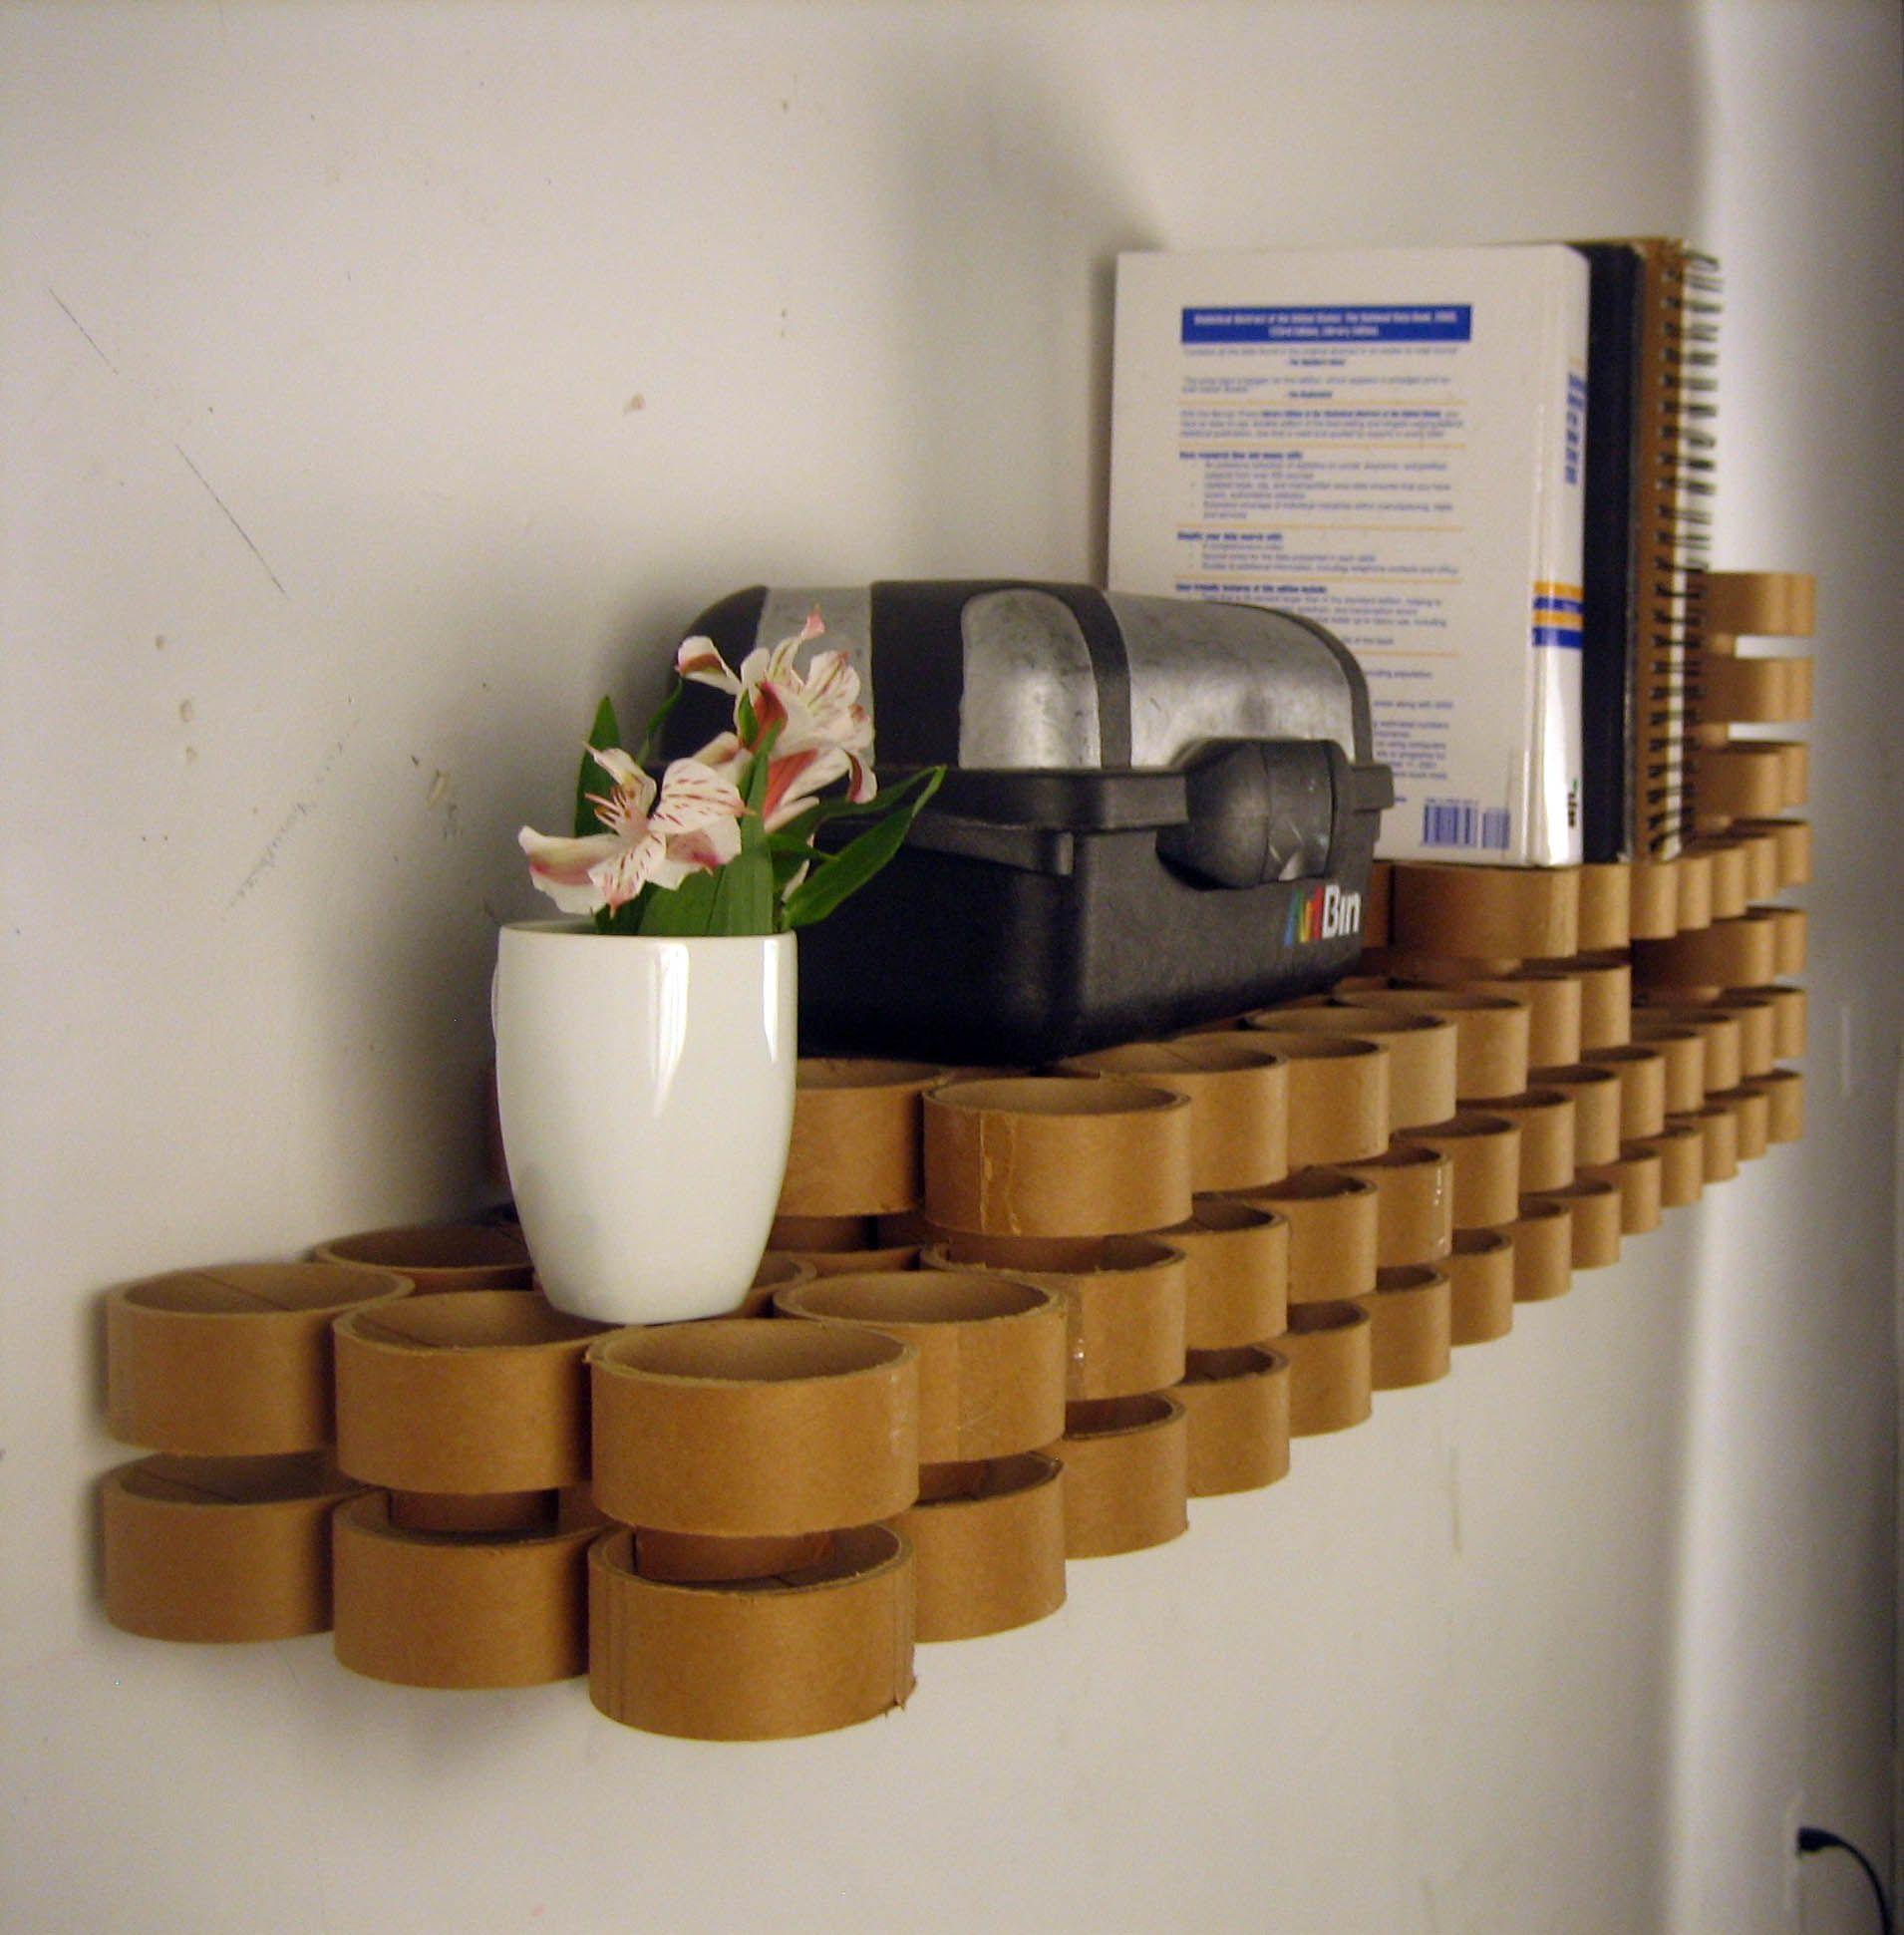 Tube Shelf By Tim Peet At Coroflot Com Shelves Pinterest Cart N # Muebles De Tubos De Carton